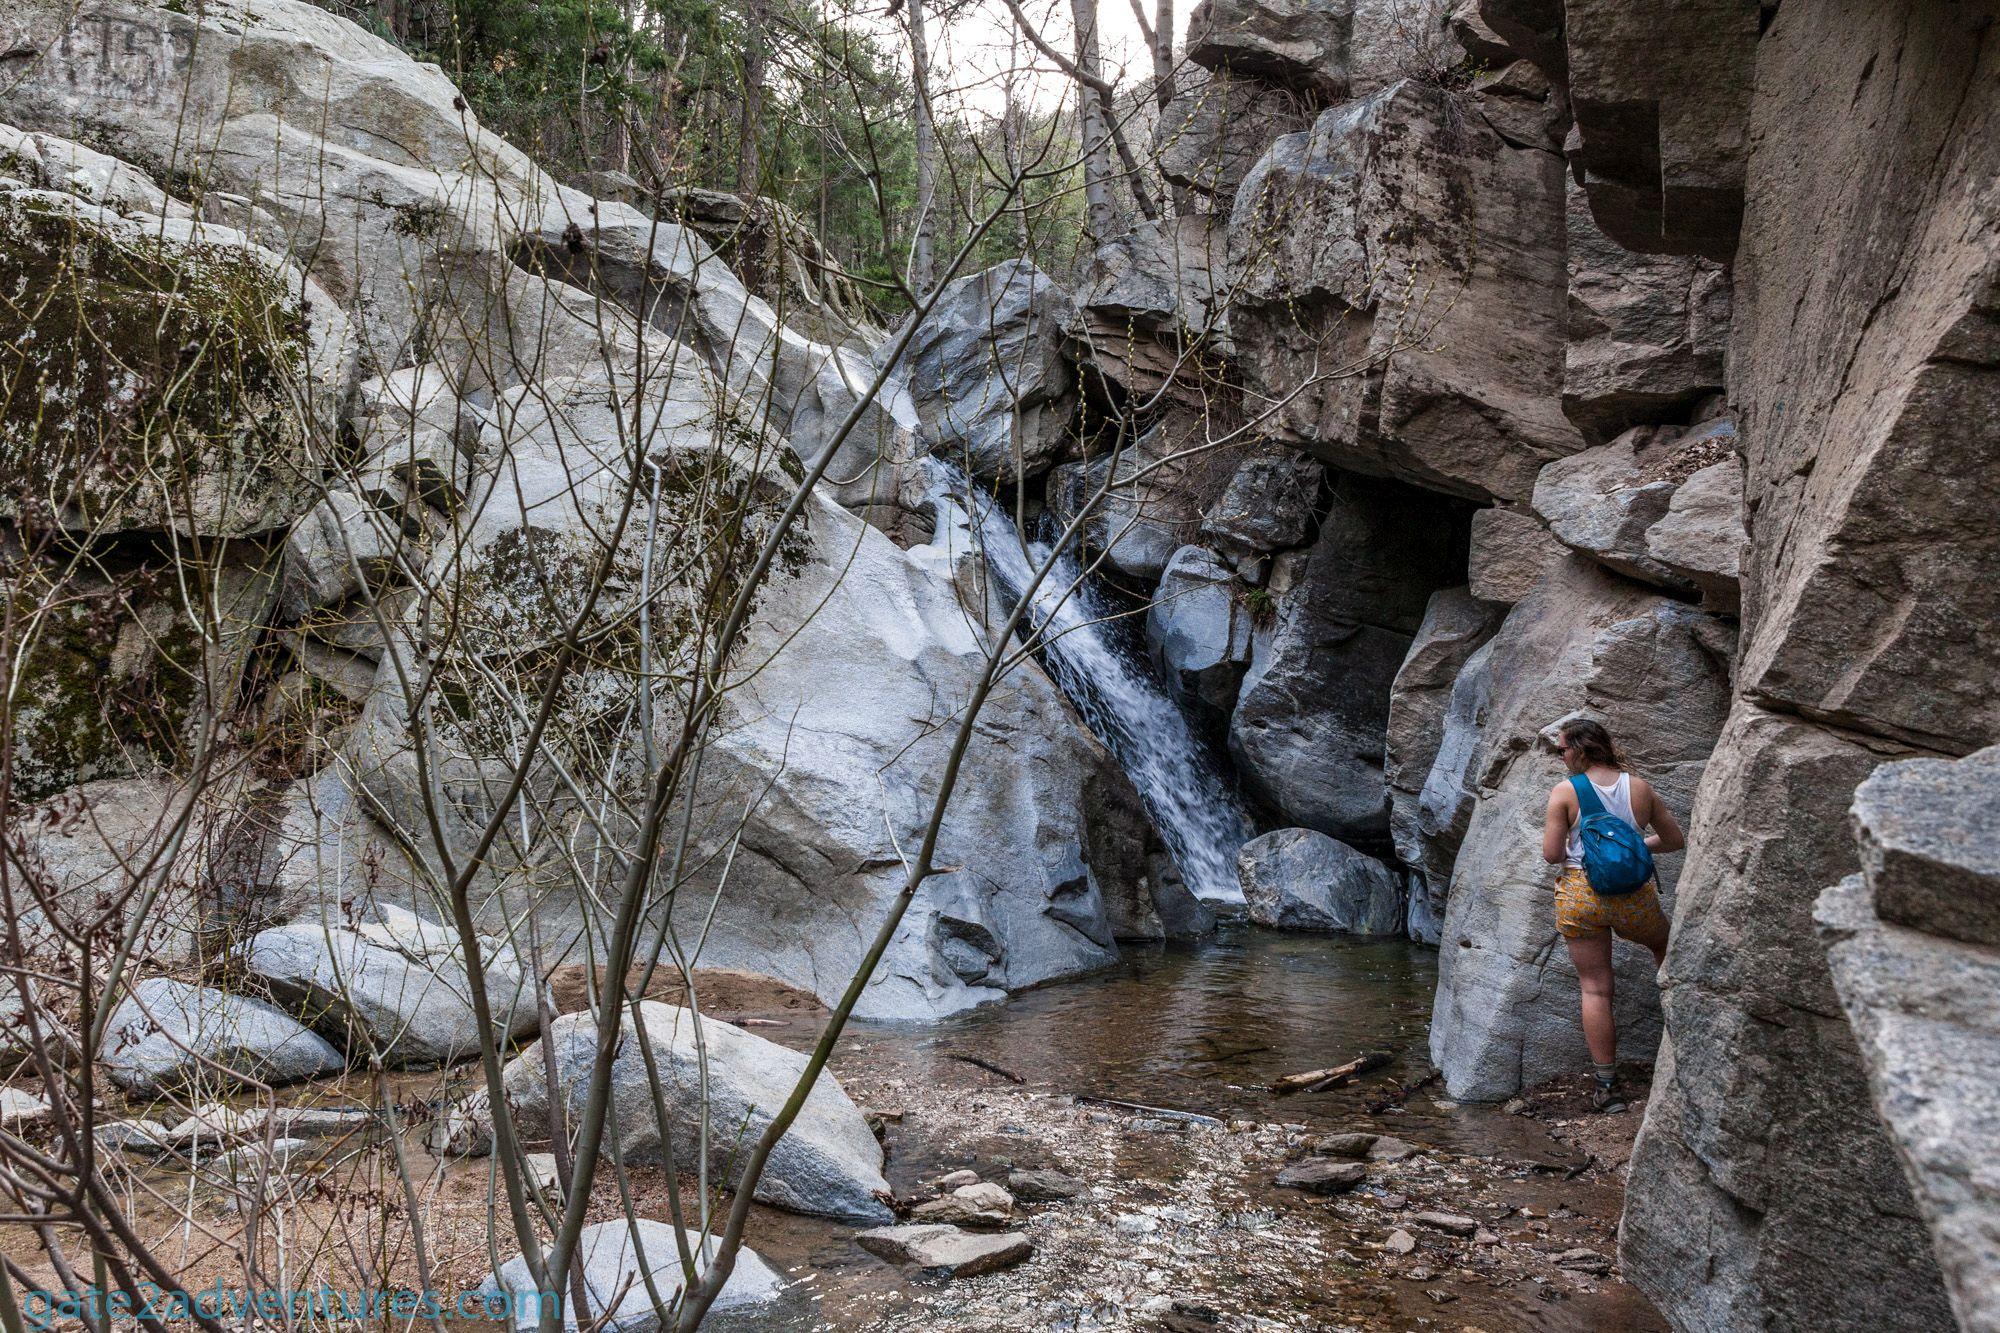 The Heart Rock Waterfall in Southern California